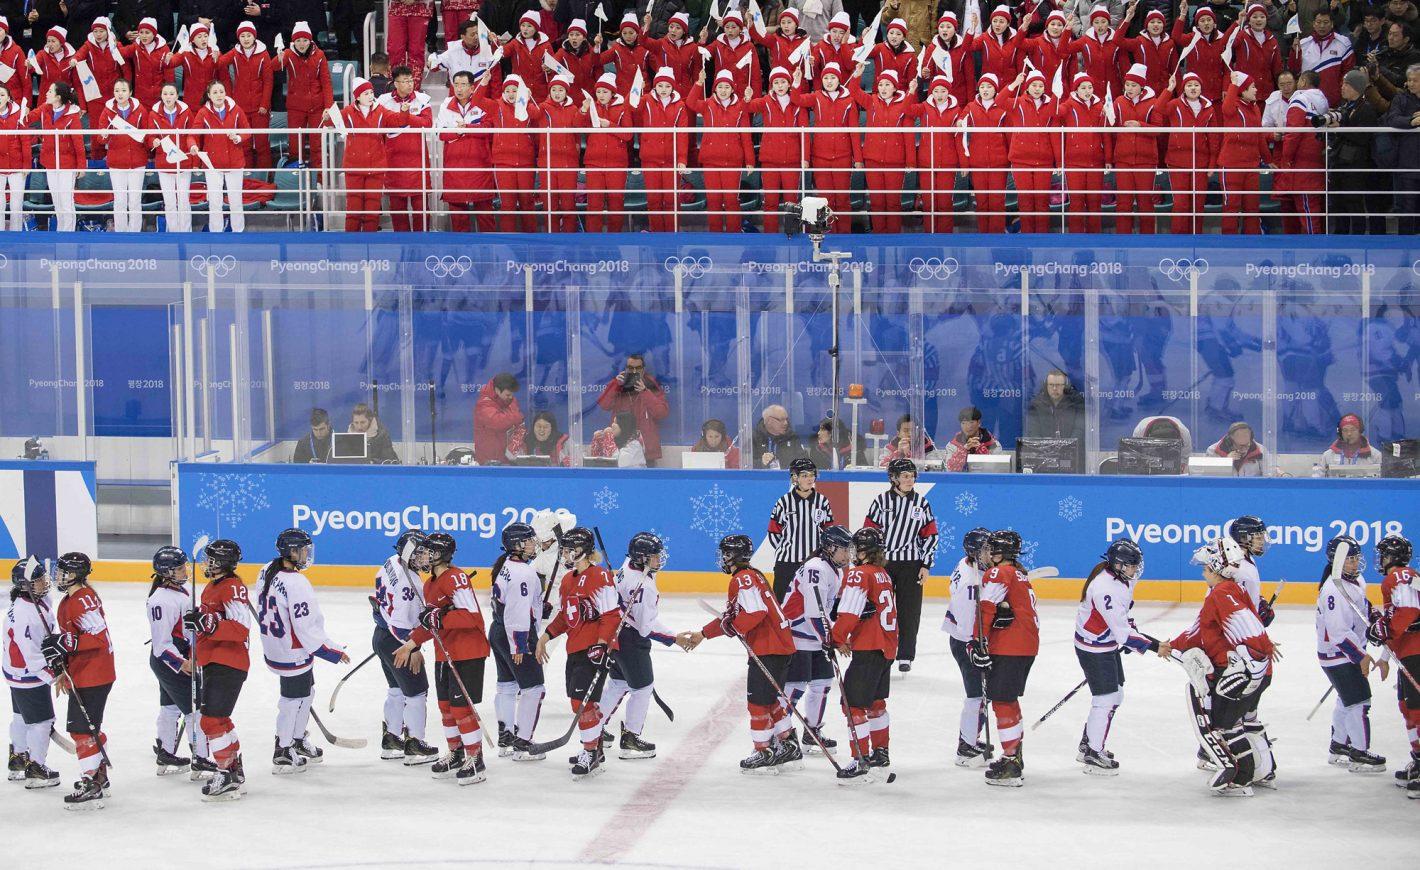 Switzerland and Korea – hand shake after the game. Women's Ice Hockey Preliminary Round Switzerland vs. Korea at Kwandong Hockey Centre on February 10, 2018 during the PyeongChang 2018 Winter Olympic Games. Nikon D5 | AF-S NIKKOR 70-200mm f/2.8E FL ED VR | ISO 1250 | 1/1250 s | f/3.5 Photo by Anke Wälischmiller/ FOTOAGENTUR SVEN SIMON